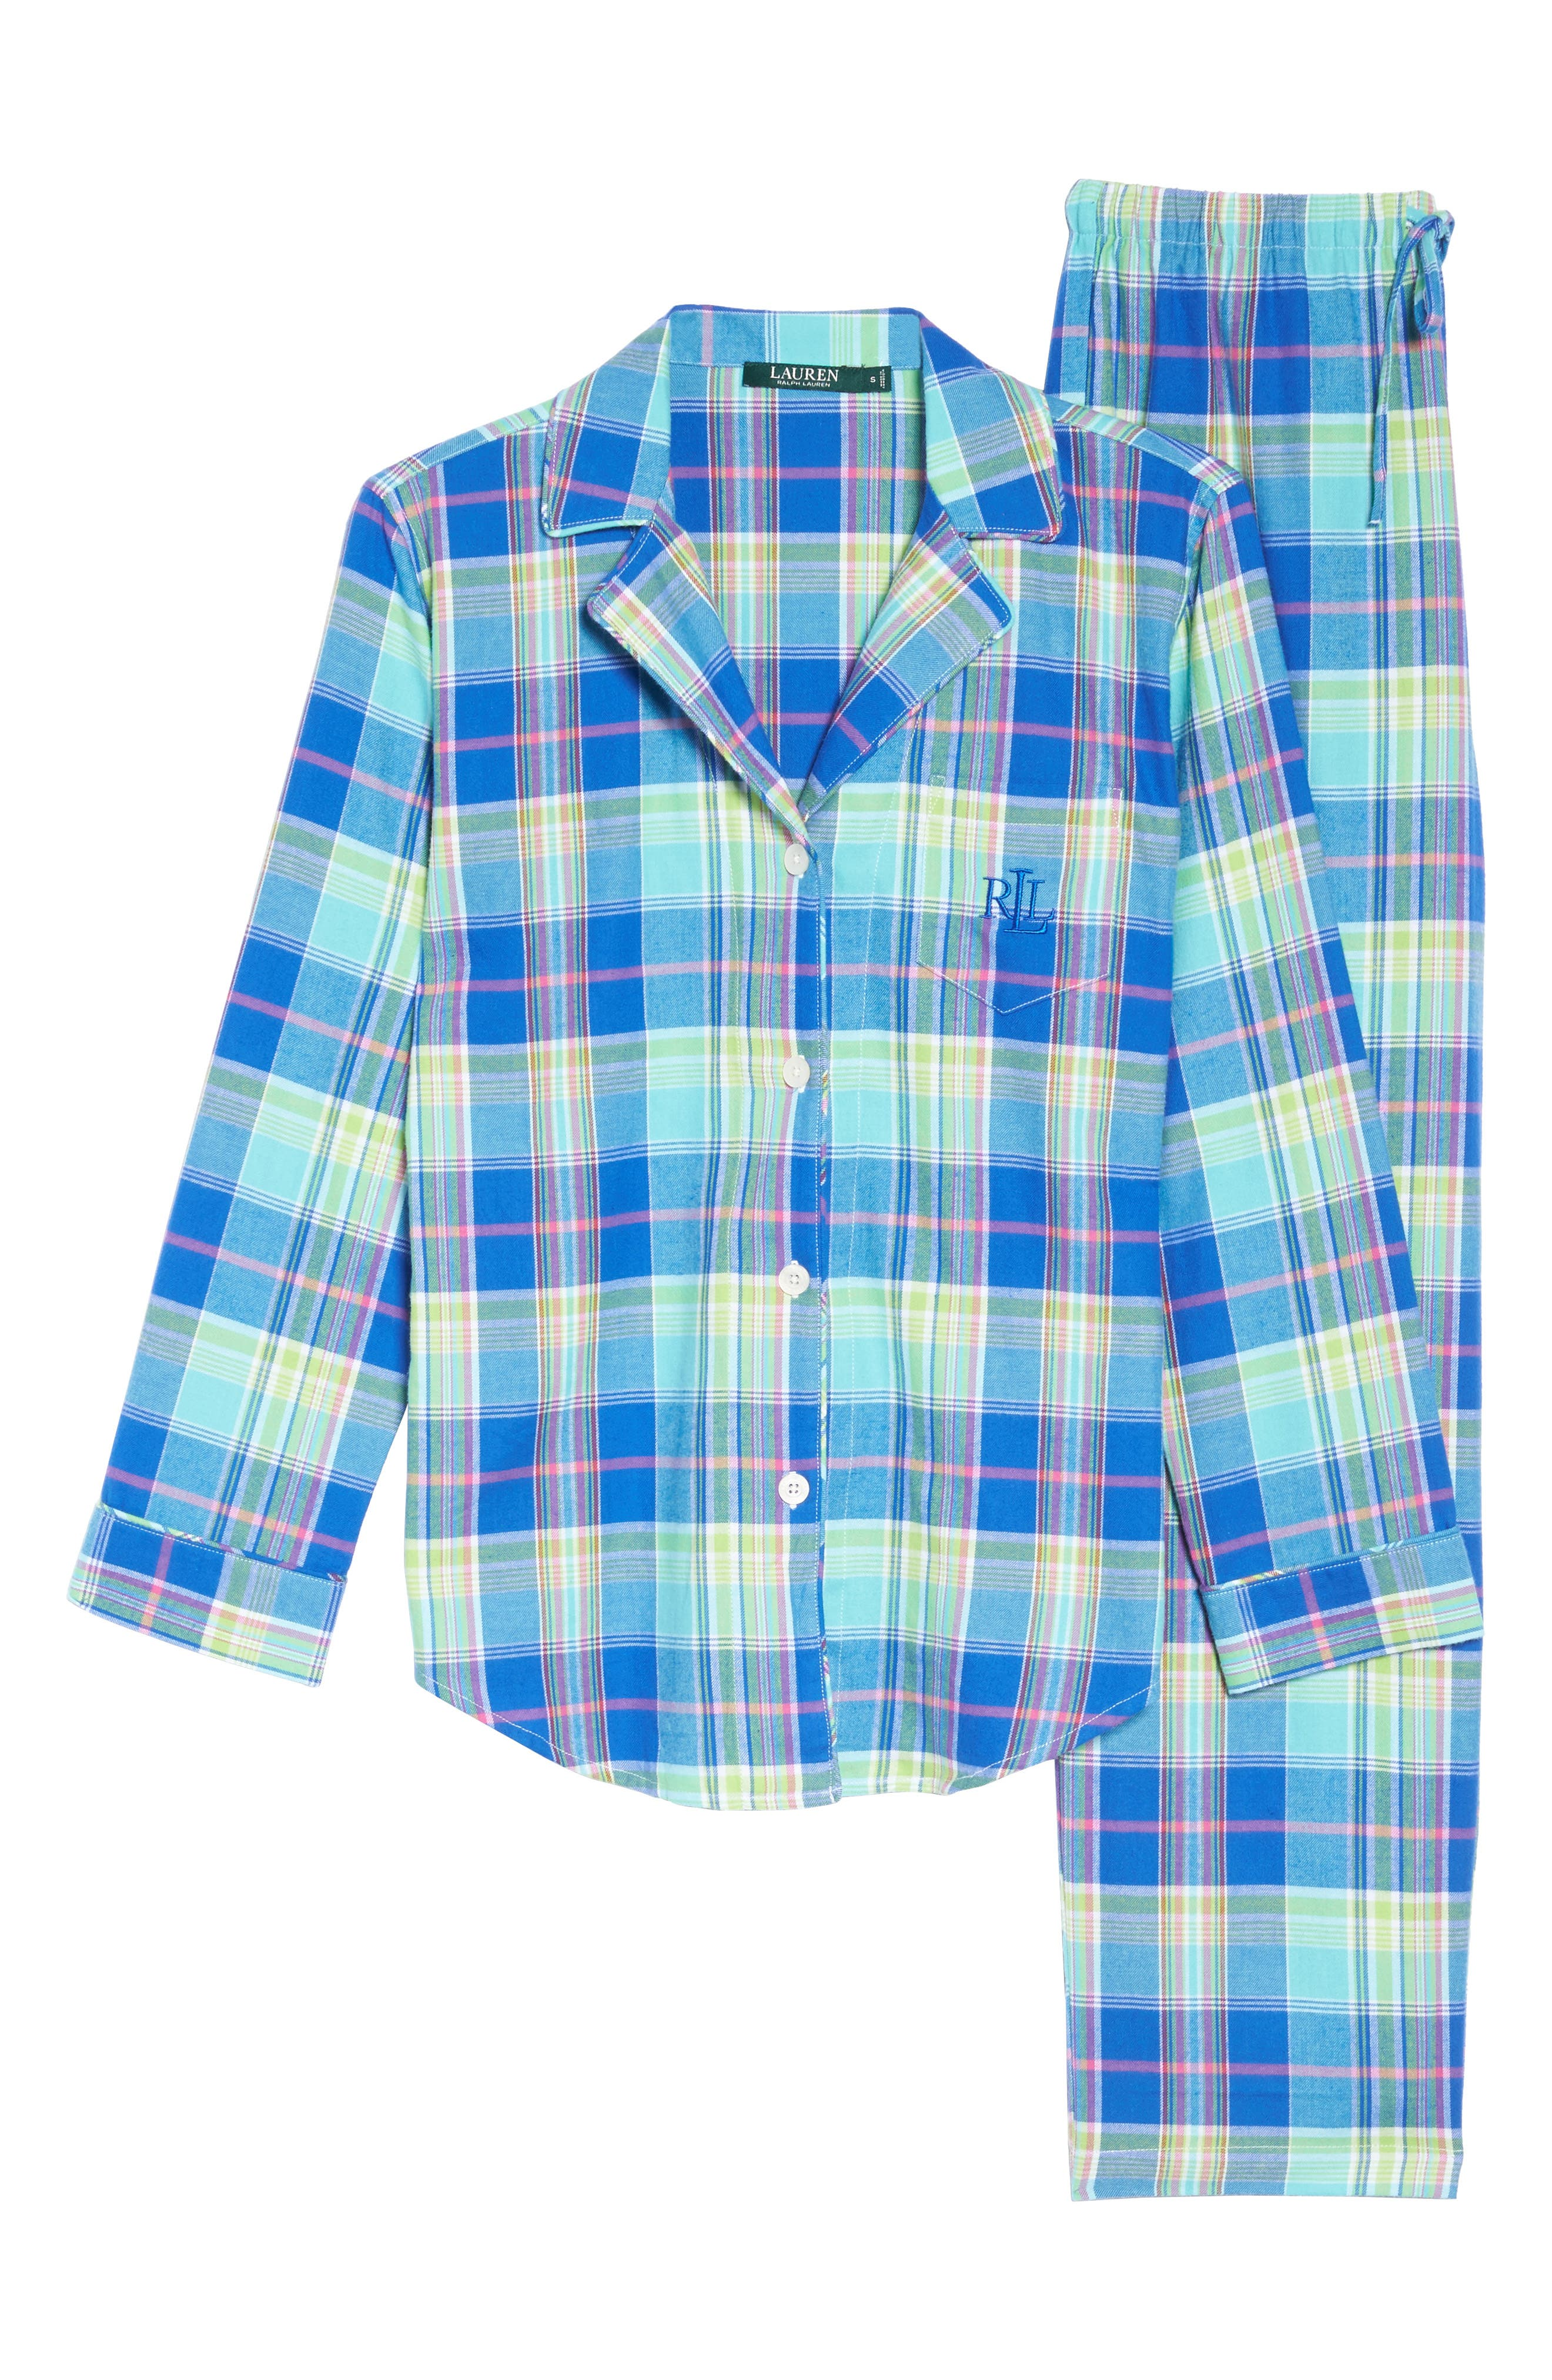 Notch Collar Pajamas,                             Alternate thumbnail 6, color,                             Turquoise Multi Plaid